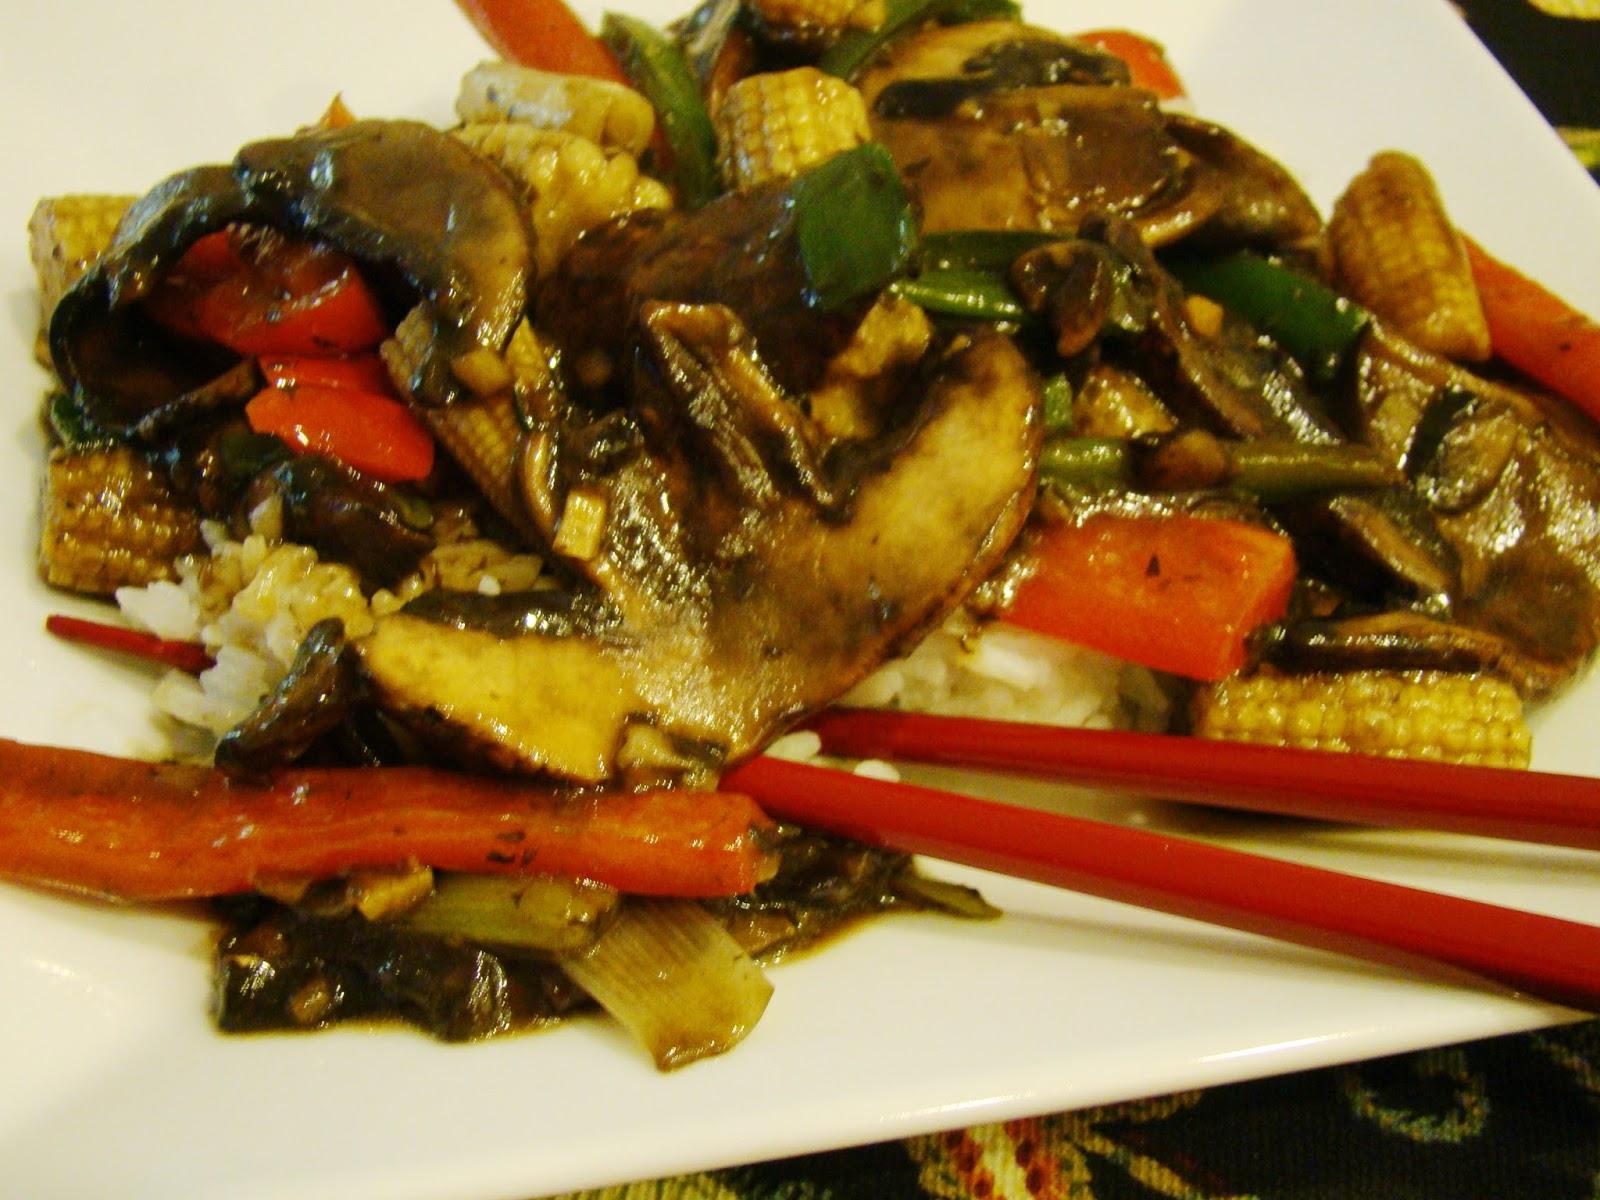 Soup Spice Everything Nice: Hunan Chili Mushrooms